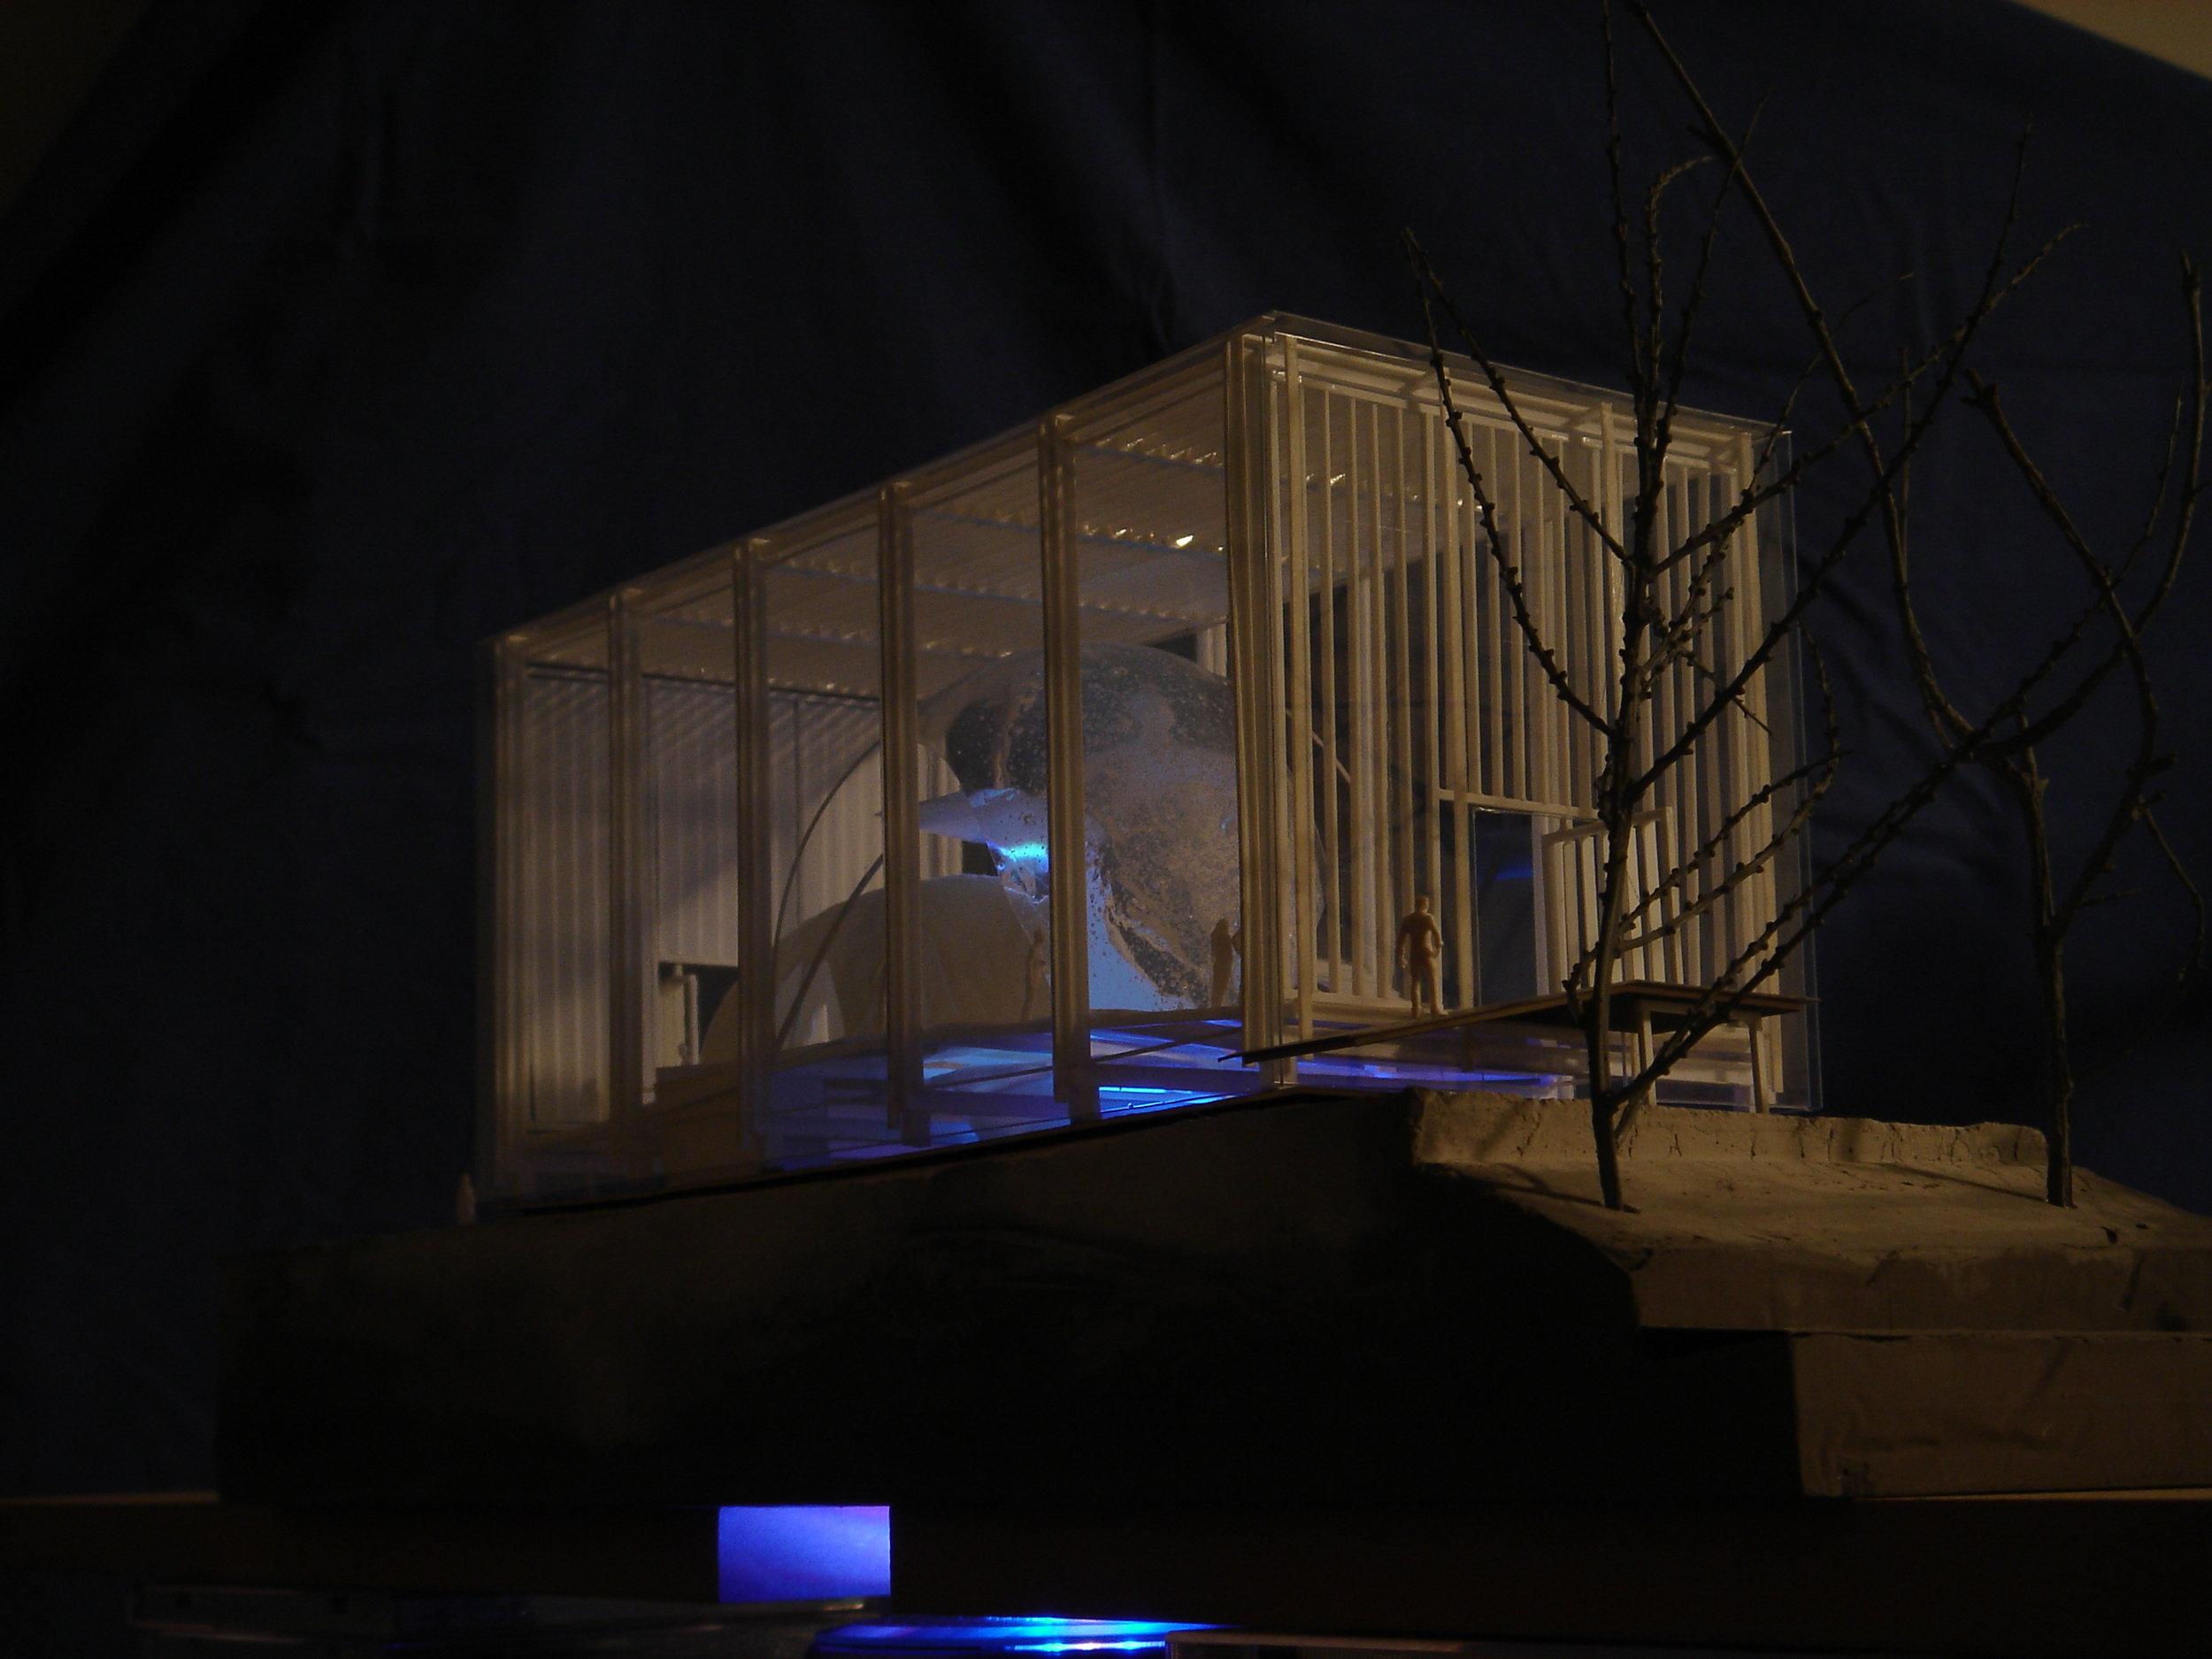 jurado-architects-composites-6.JPG